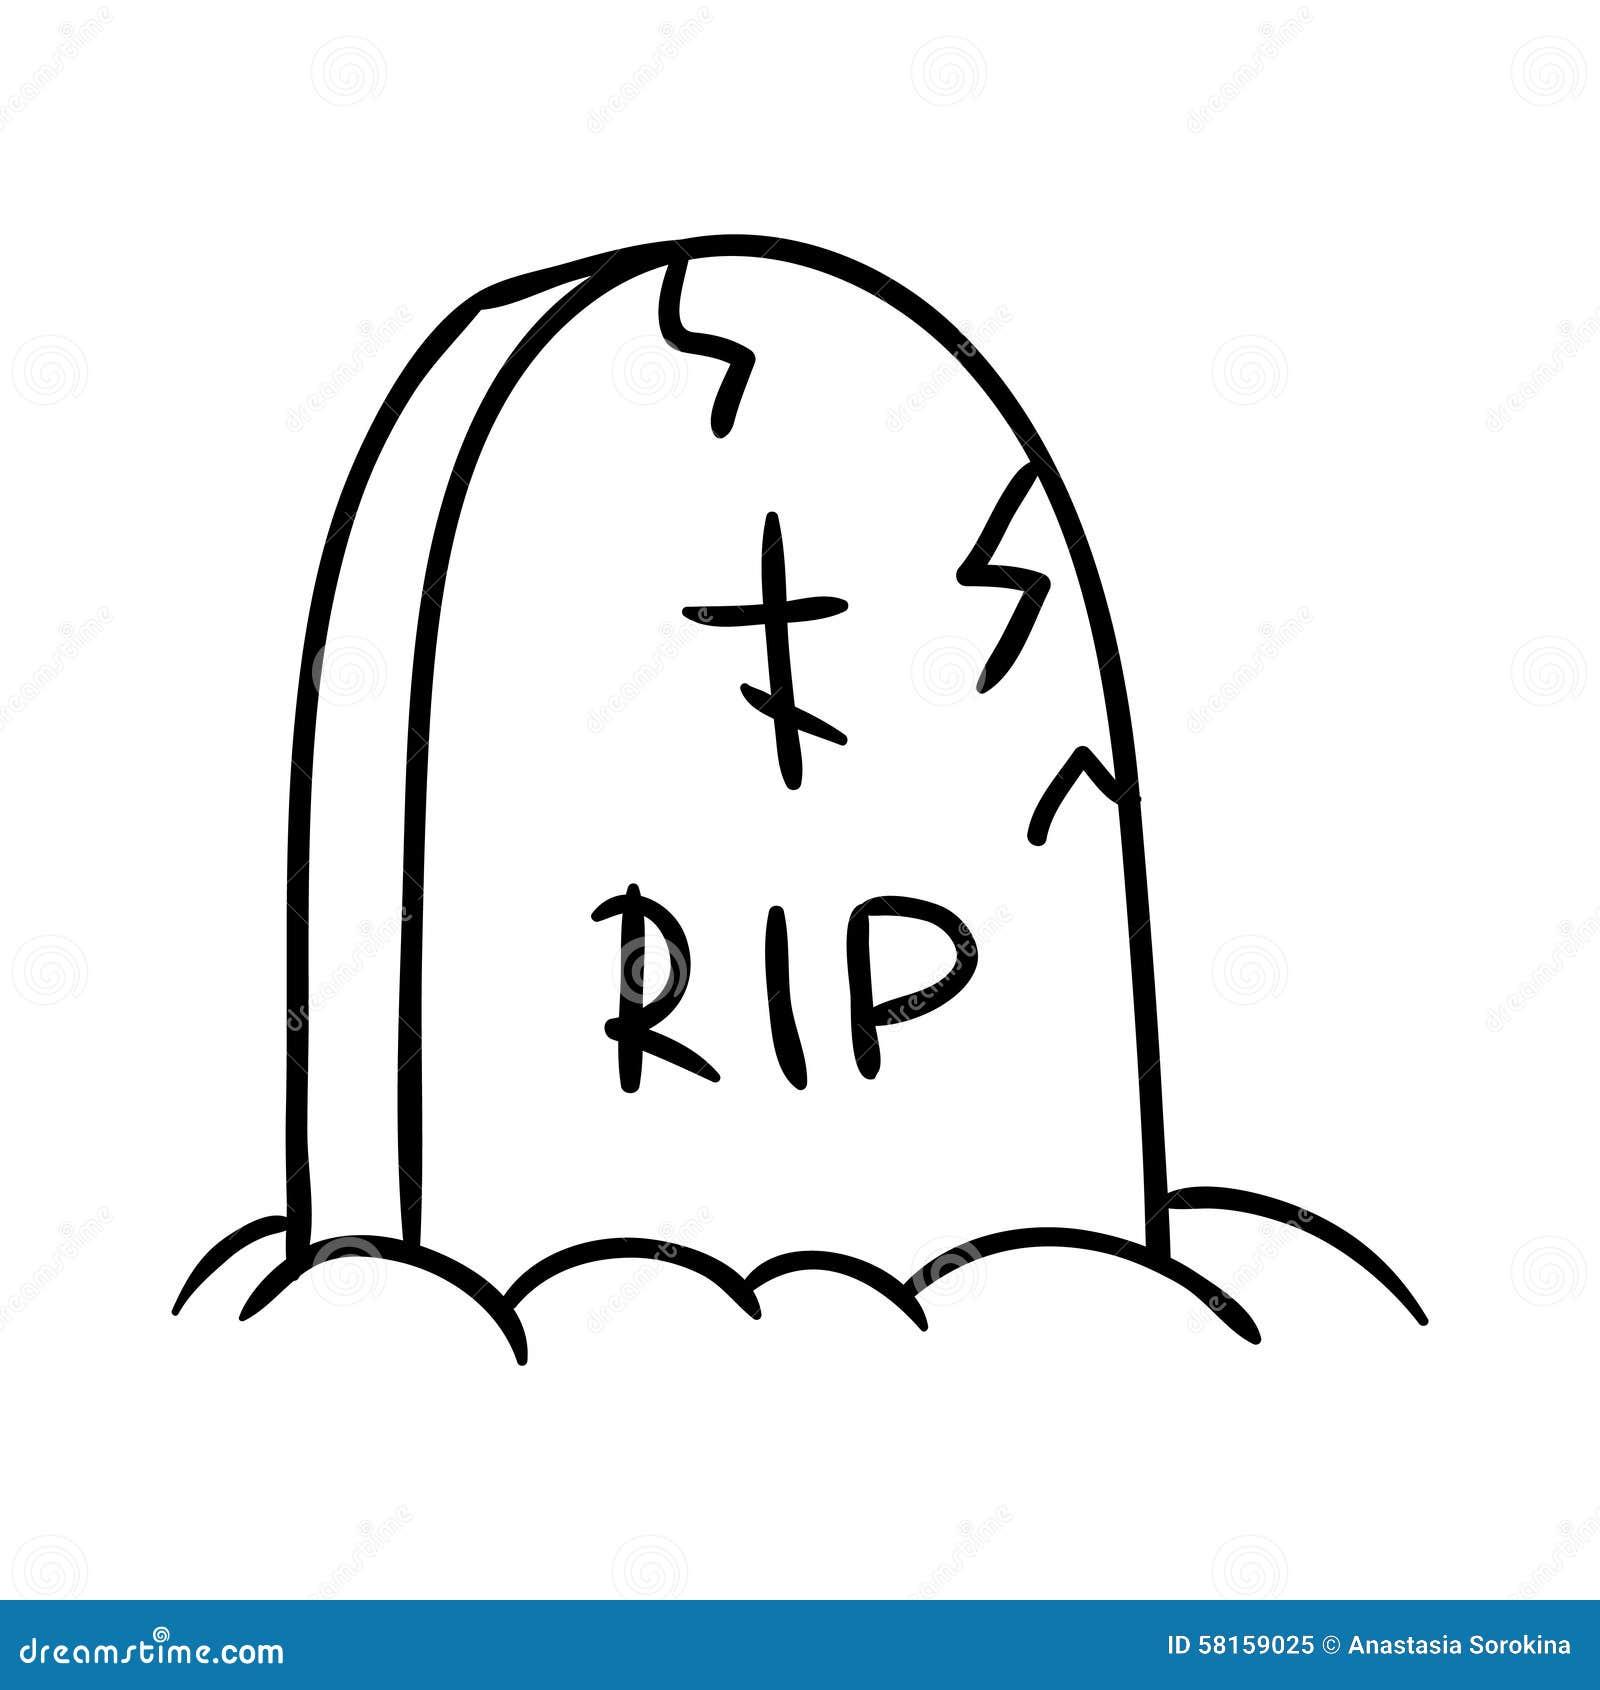 tombstone stock illustration image 58159025 headstone clip art designs headstone clipart for a headstone